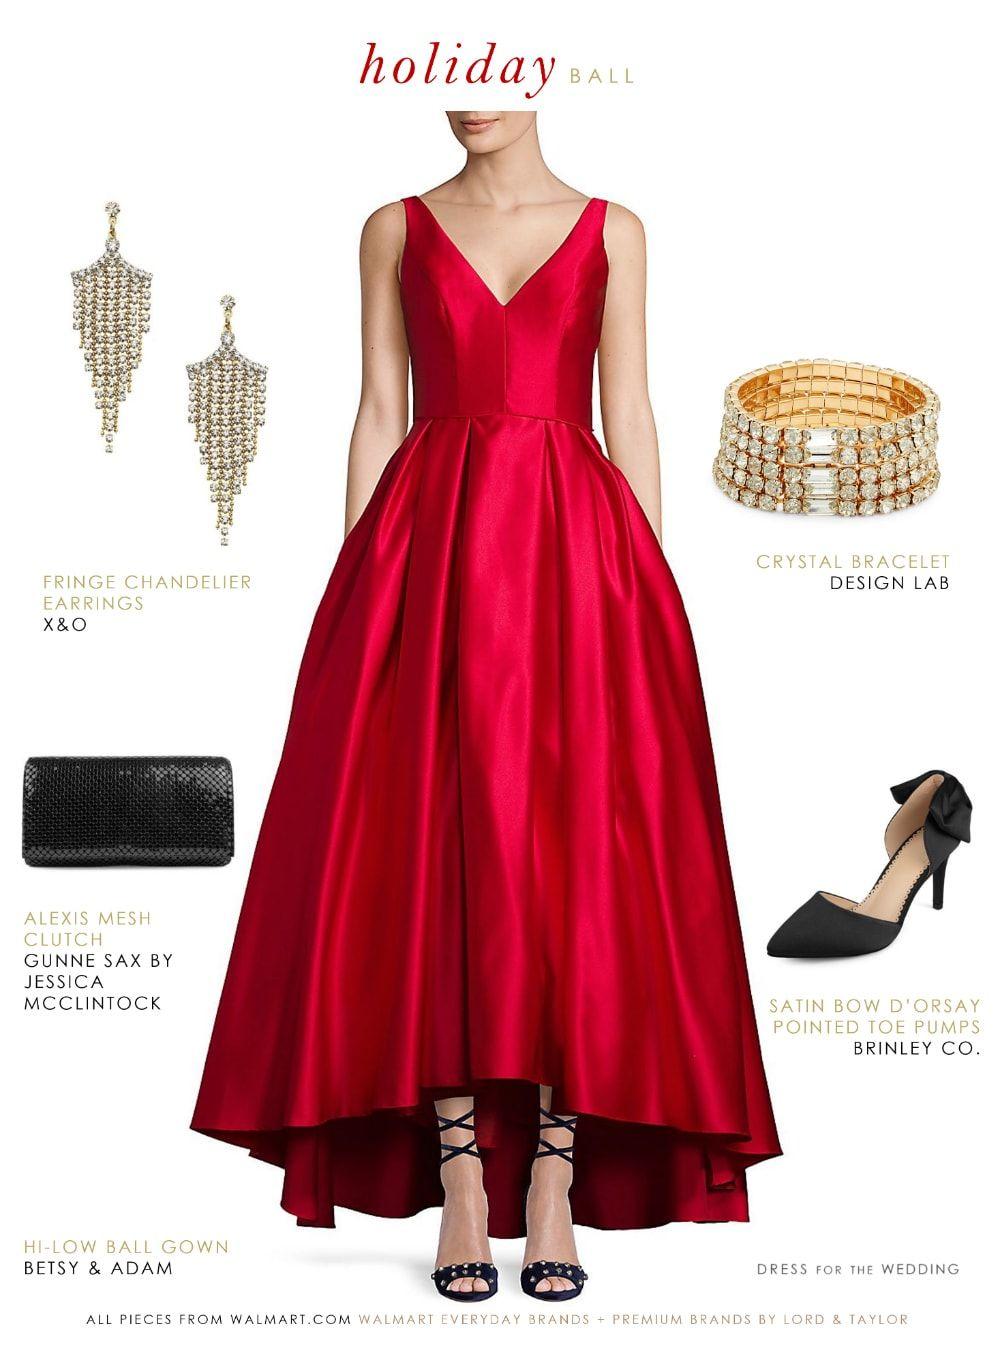 Holiday Attire Ideas For The 2018 Season Dress For The Wedding Wedding Guest Dress Wedding Guest Dress Summer Holiday Attire